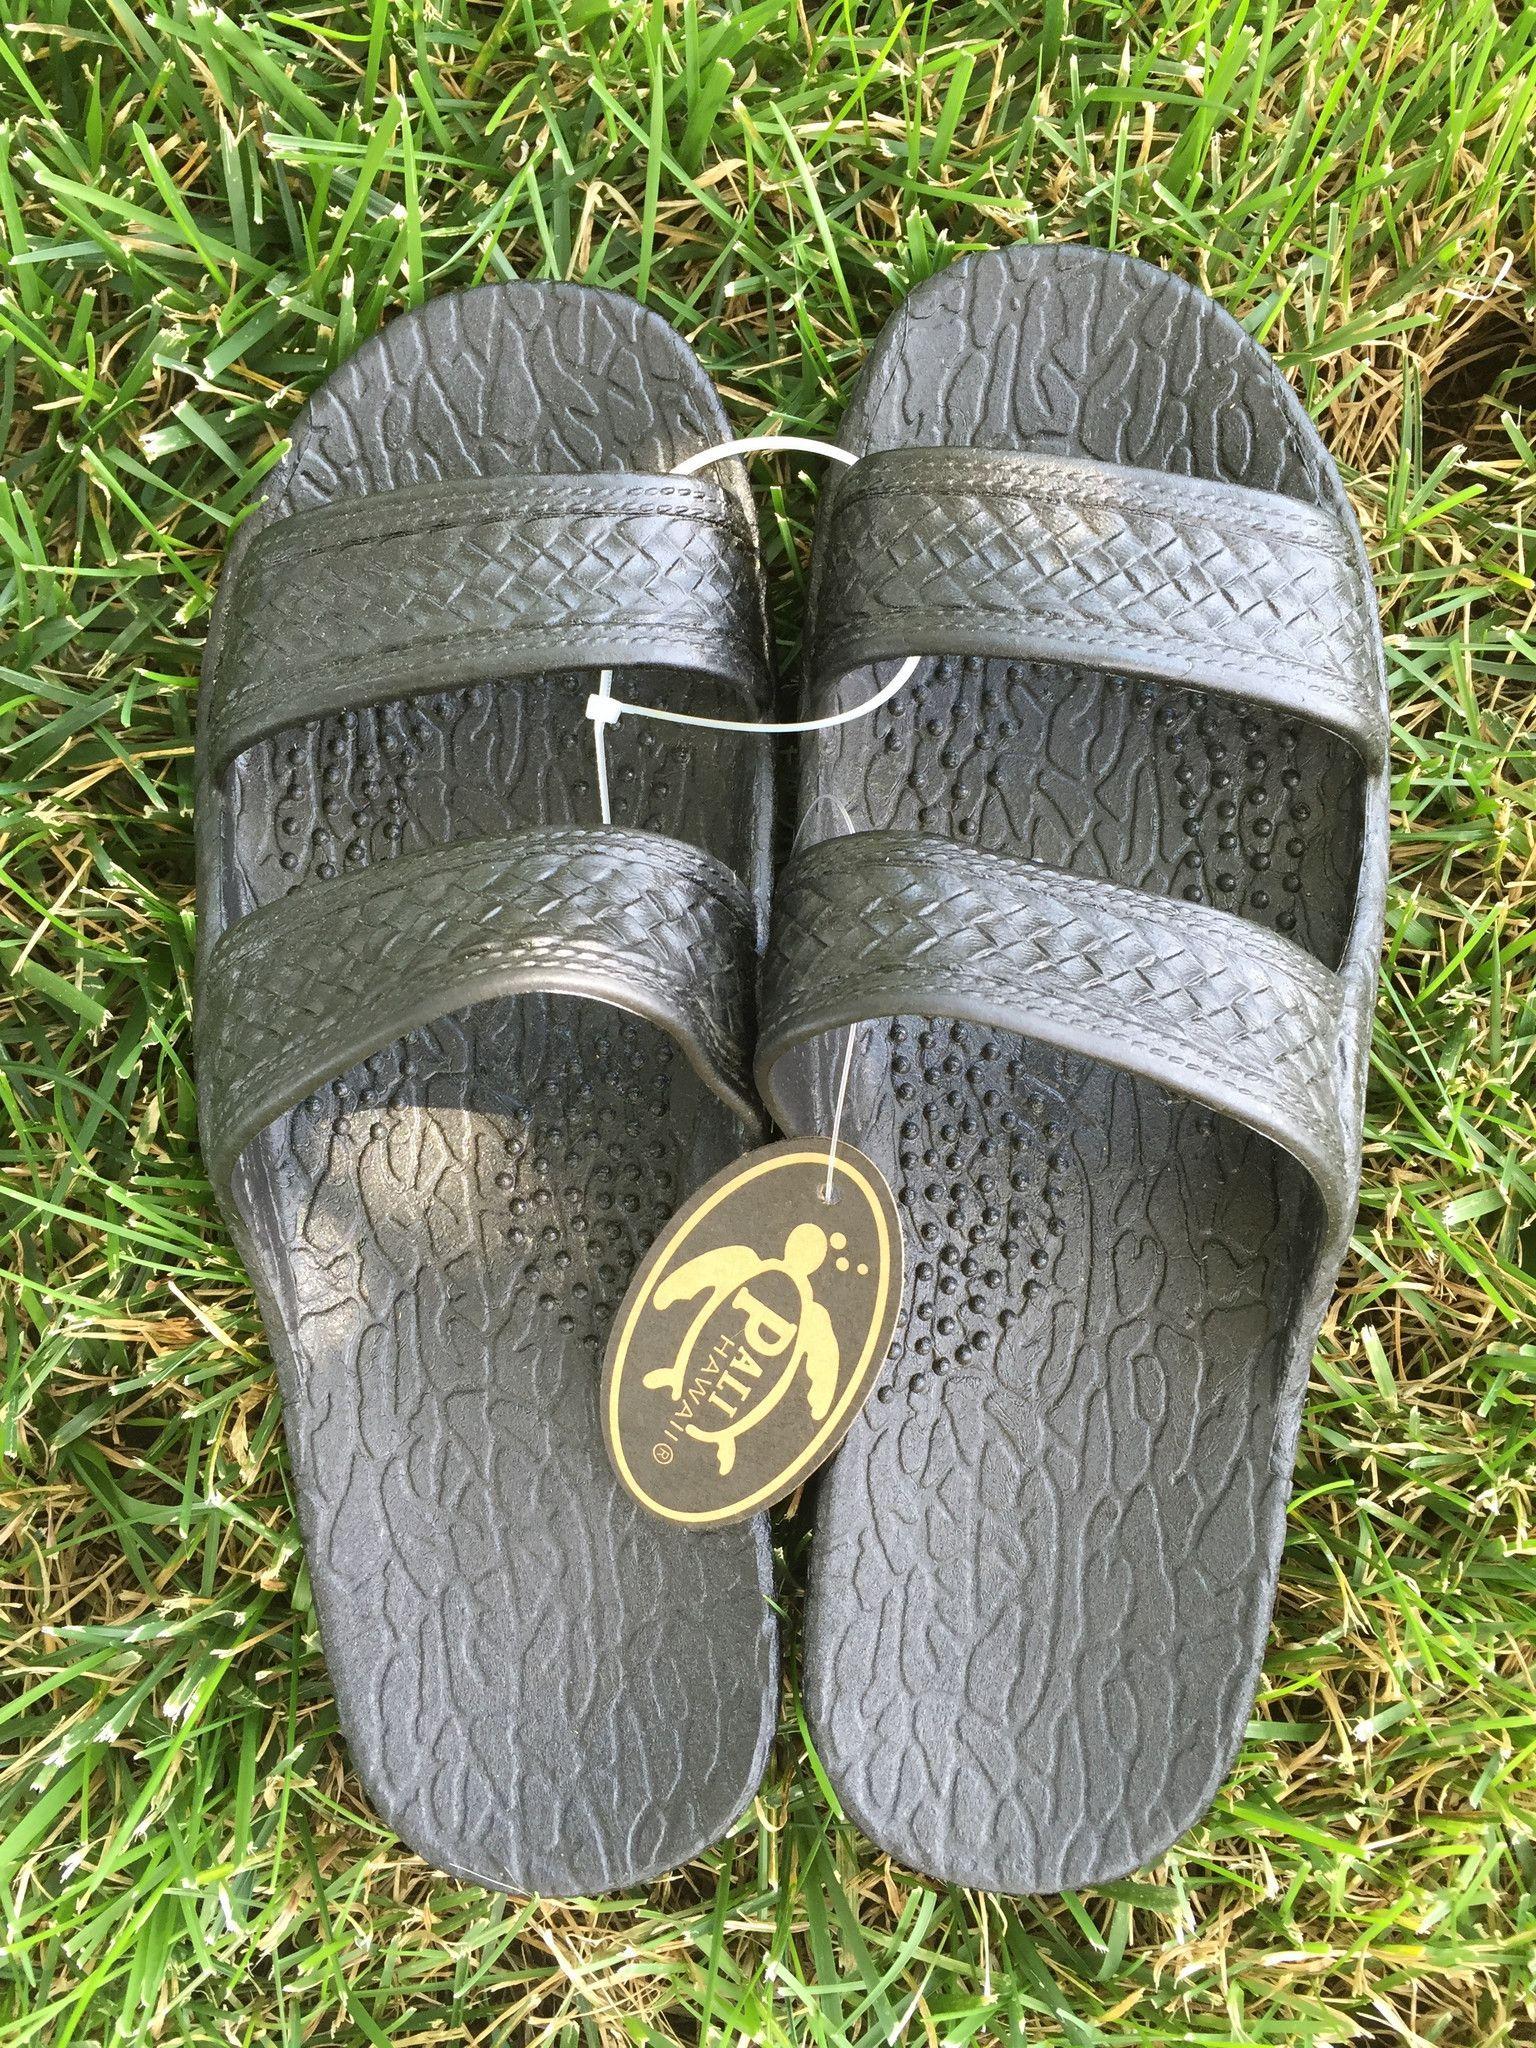 Black jesus sandals - Pali Hawaii Sandals Jandals Jesus Sandals Black